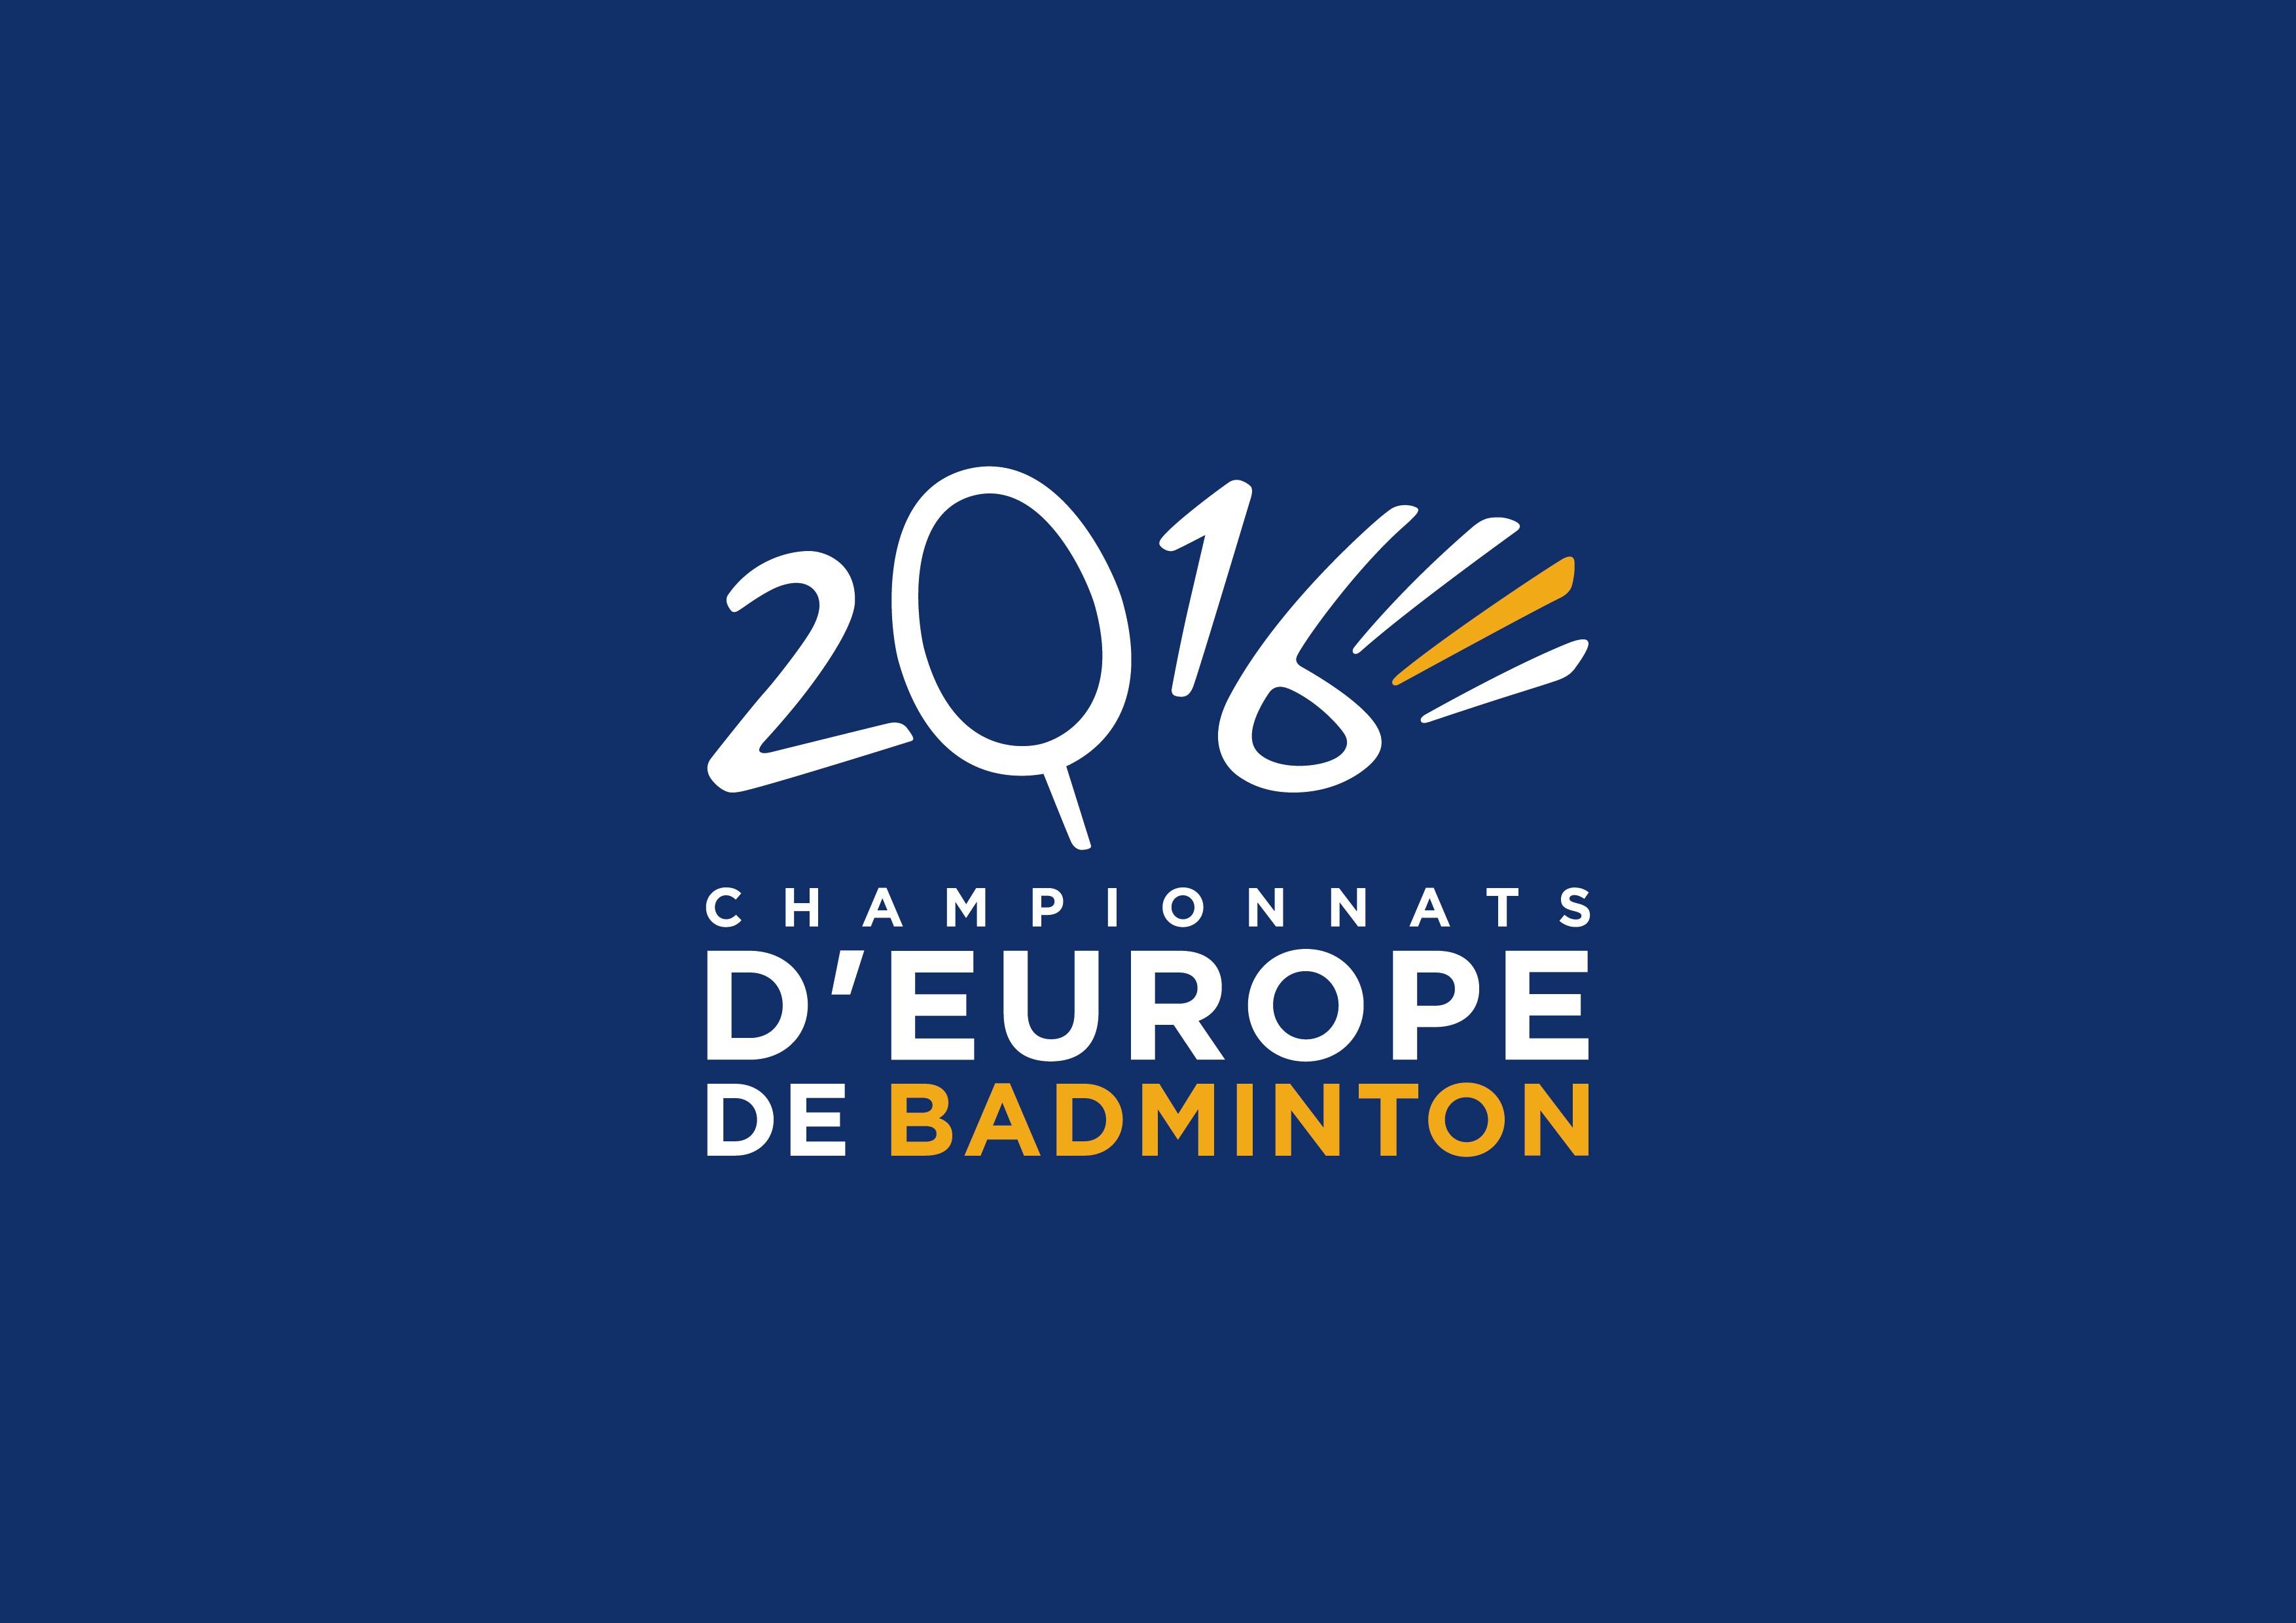 logo championnats d'europe badminton 2016 france